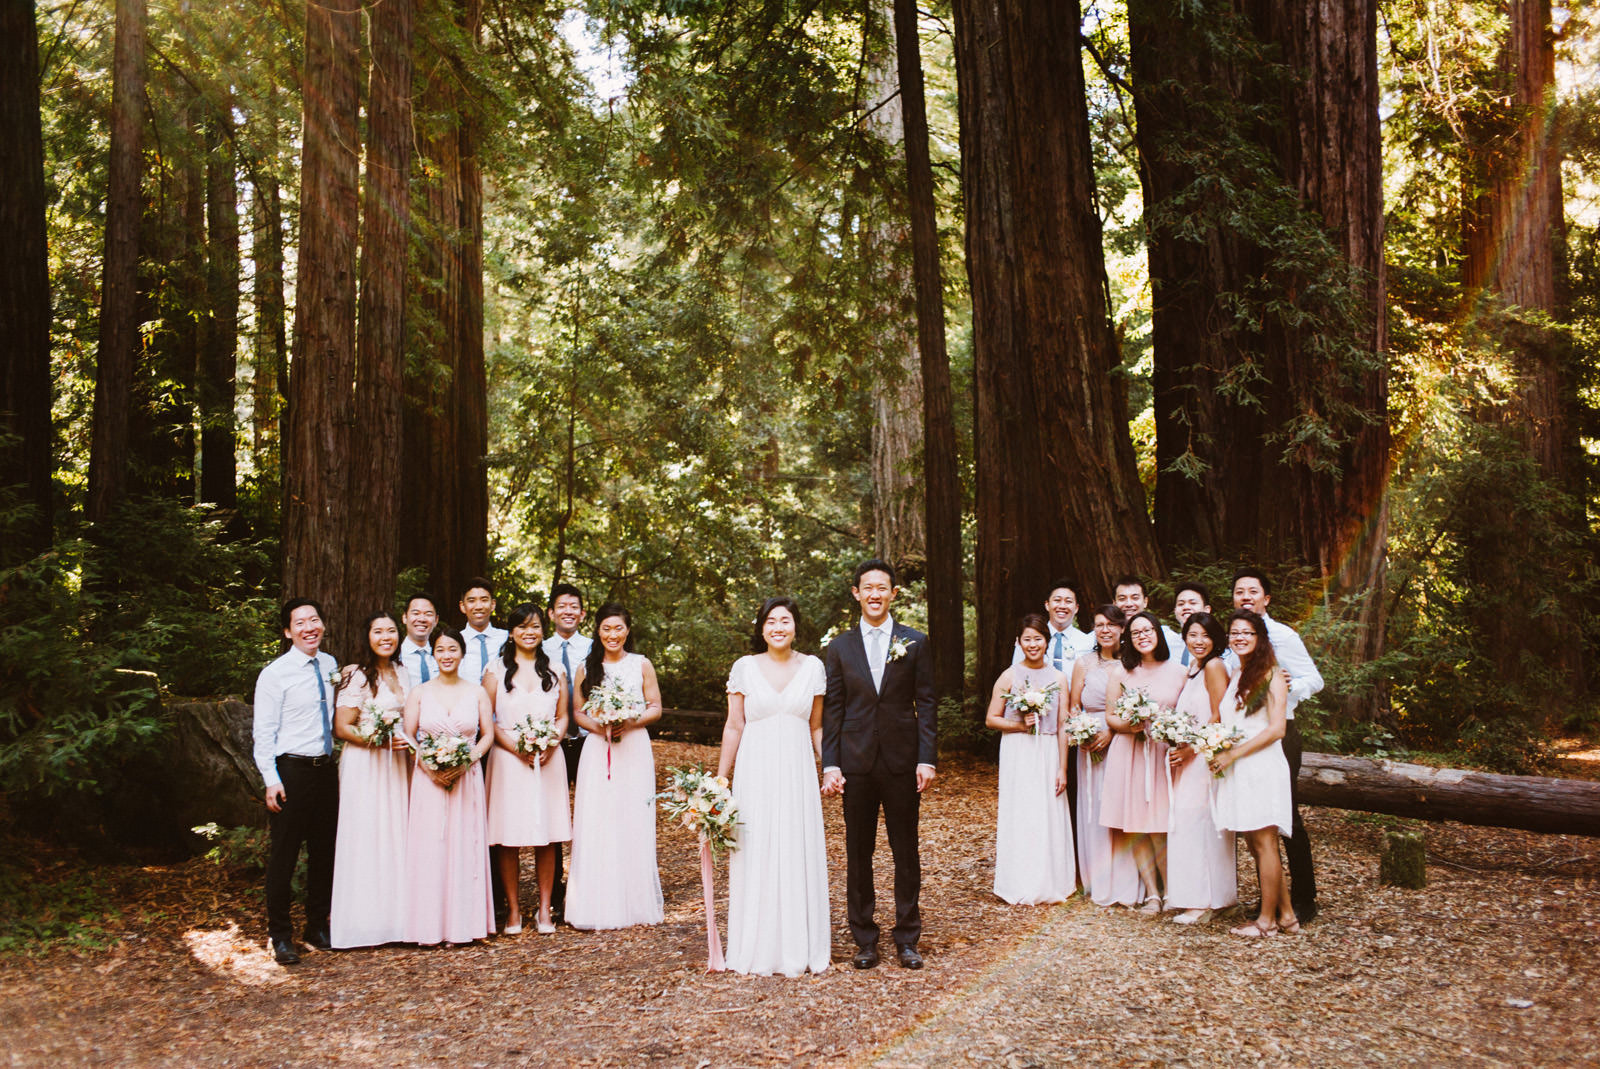 kimclay-blog-011 REDWOOD FOREST WEDDING